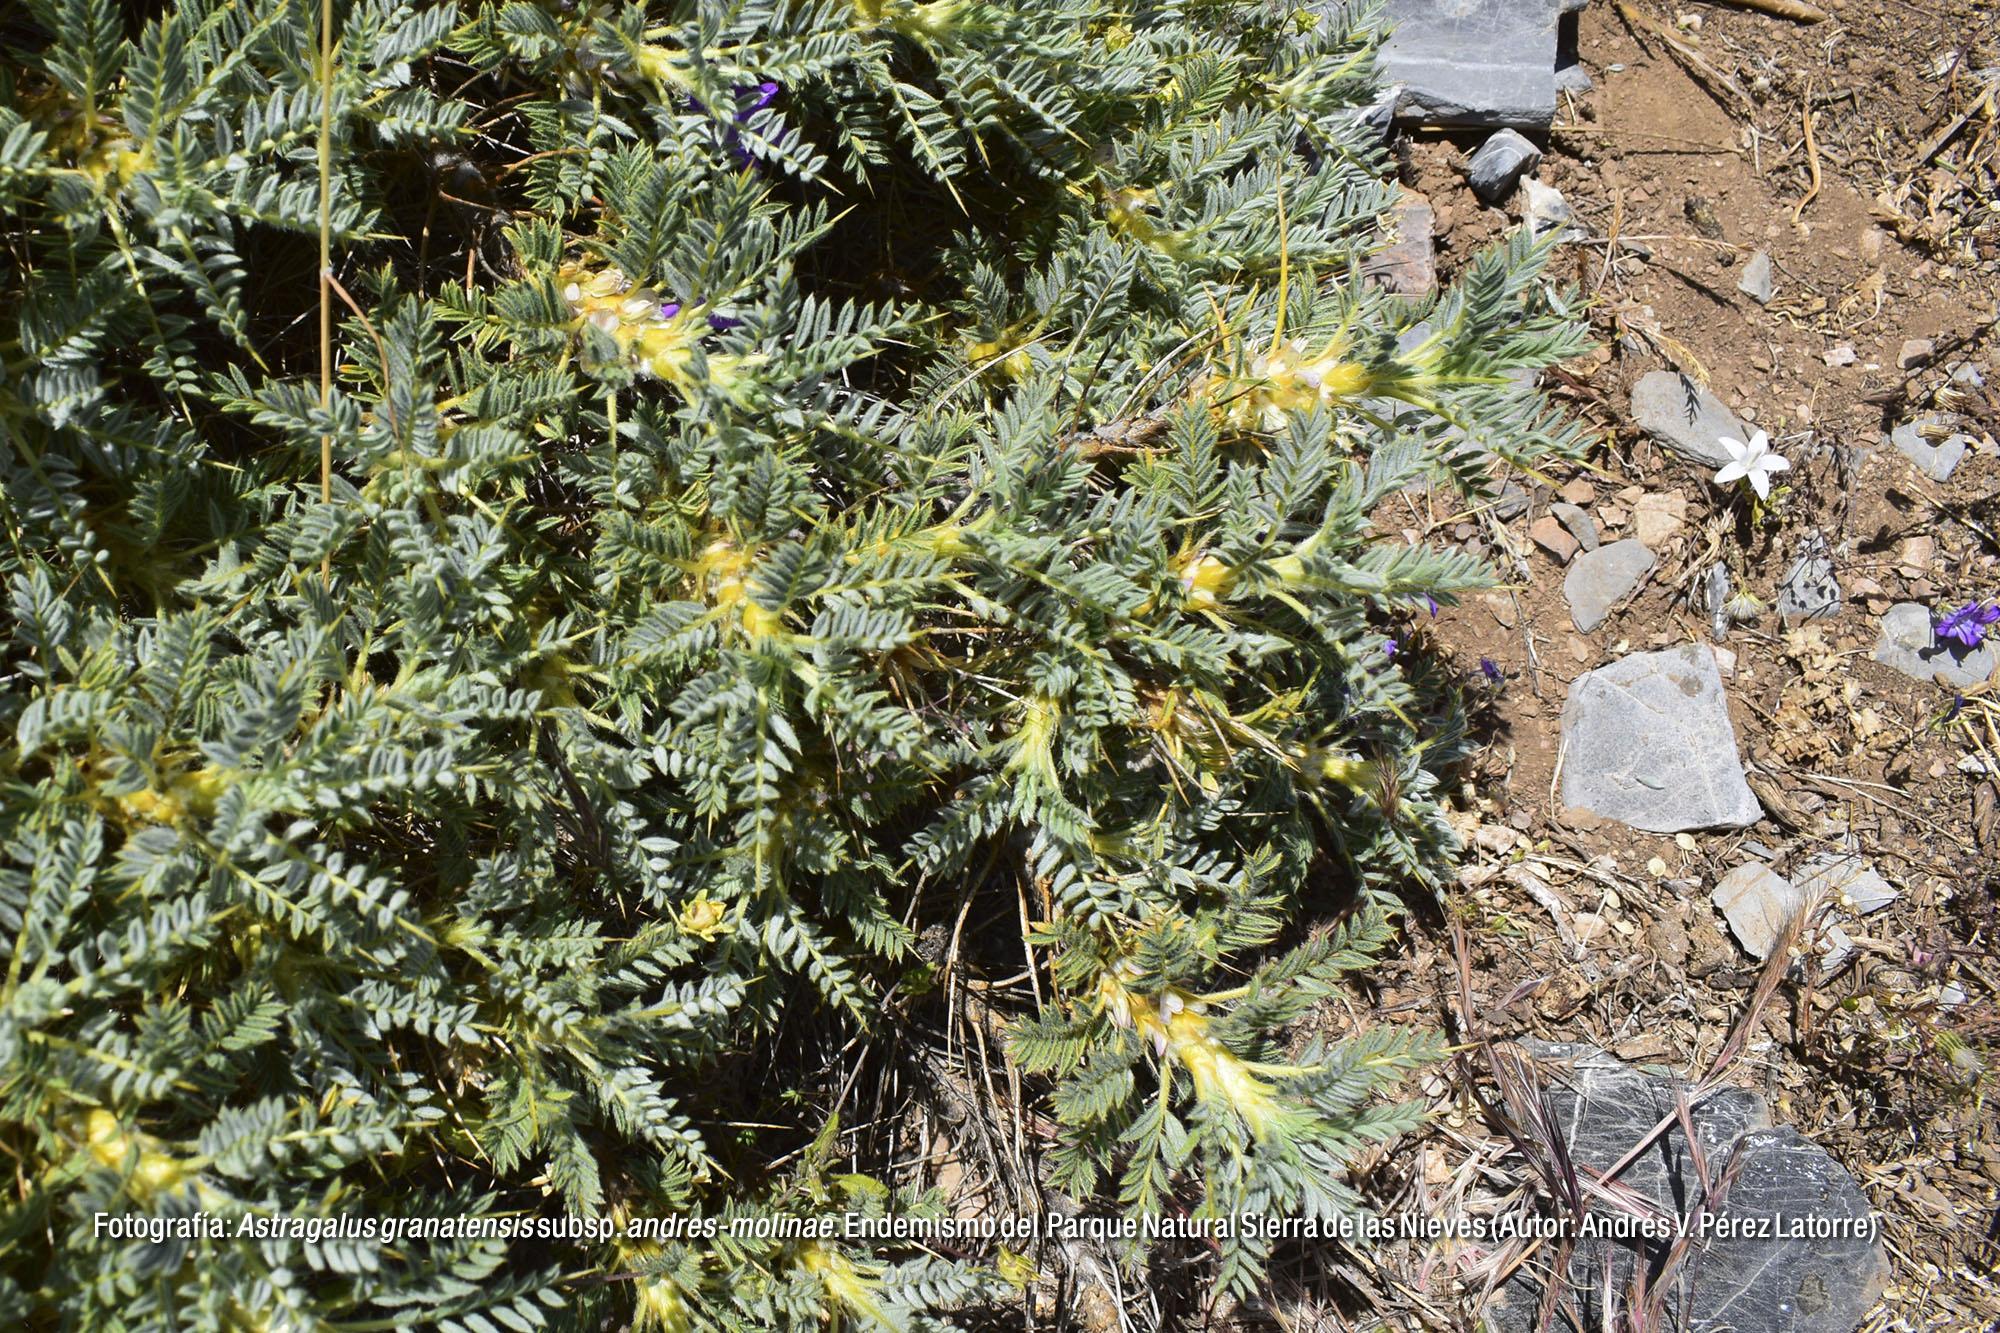 Astragalus granatensis subsp. andres-molinae. Endemismo del Parque Natural Sierra de las Nieves